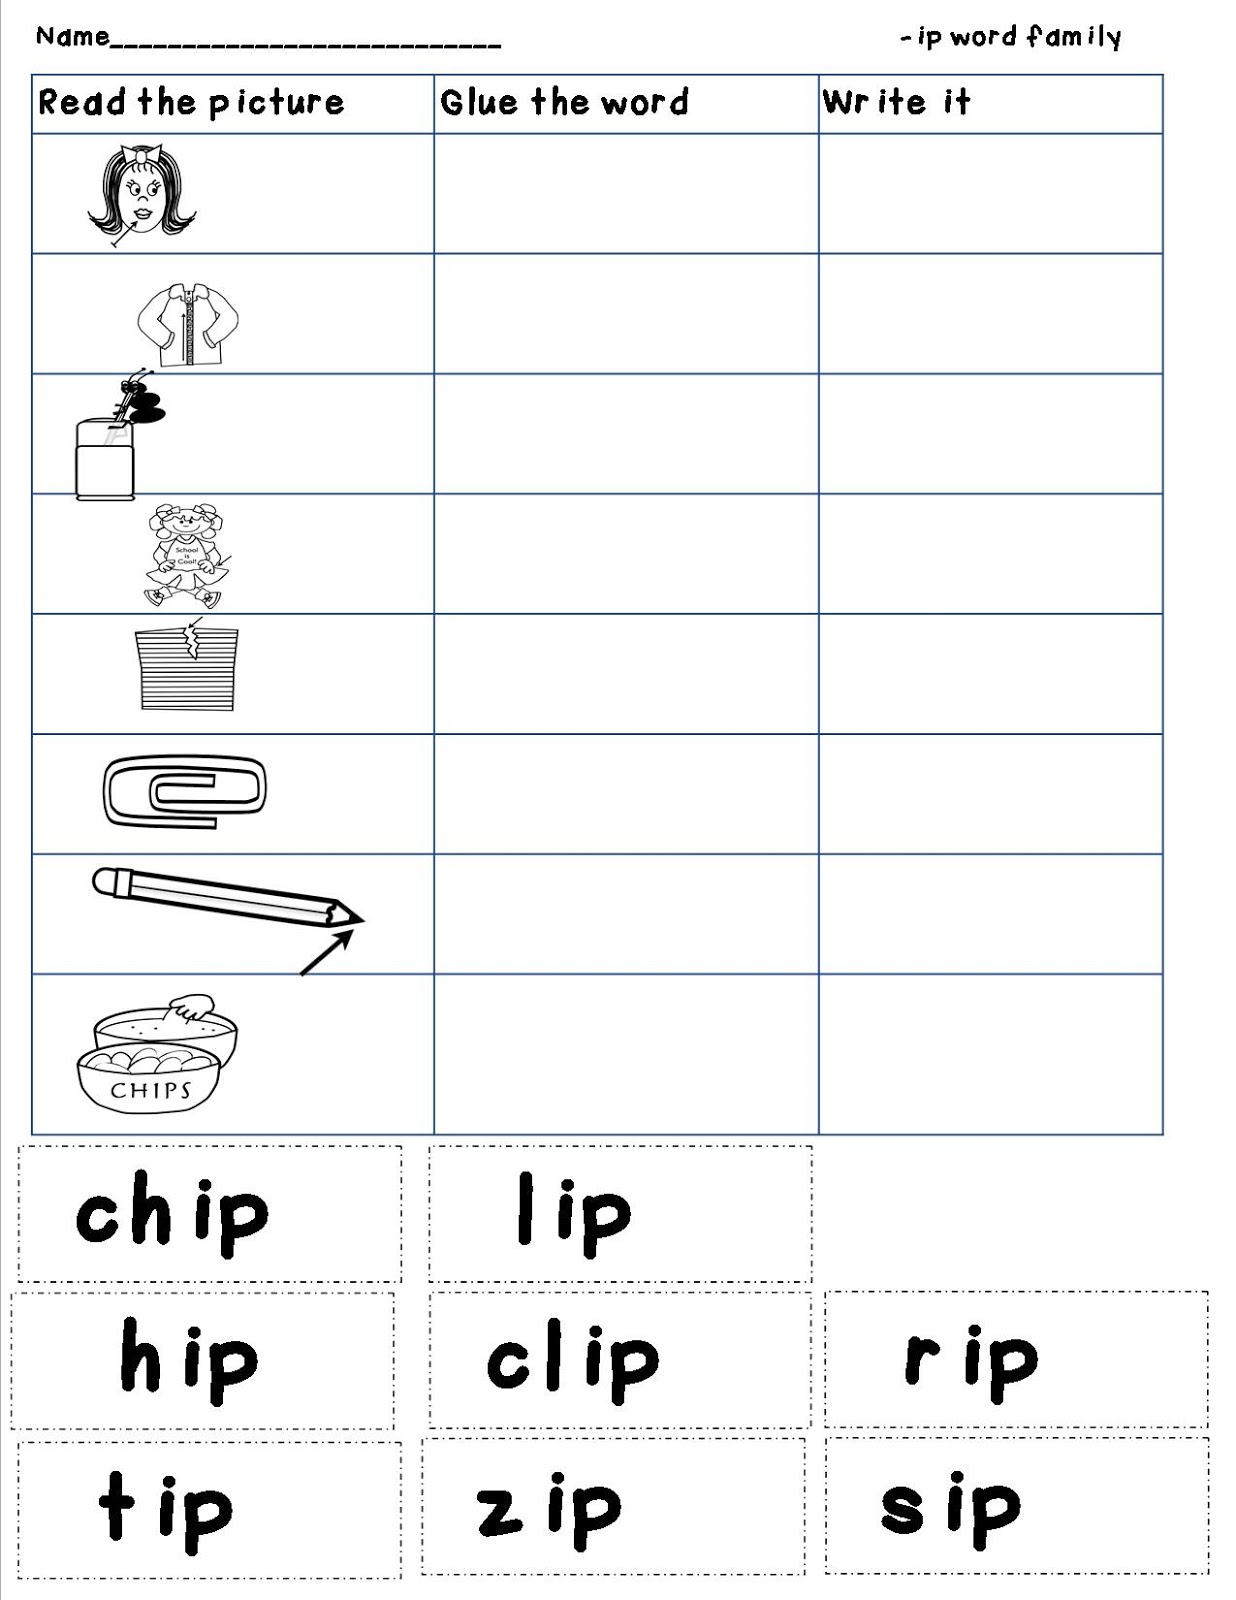 Mrs. Bohaty's Kindergarten Kingdom: -ip word family